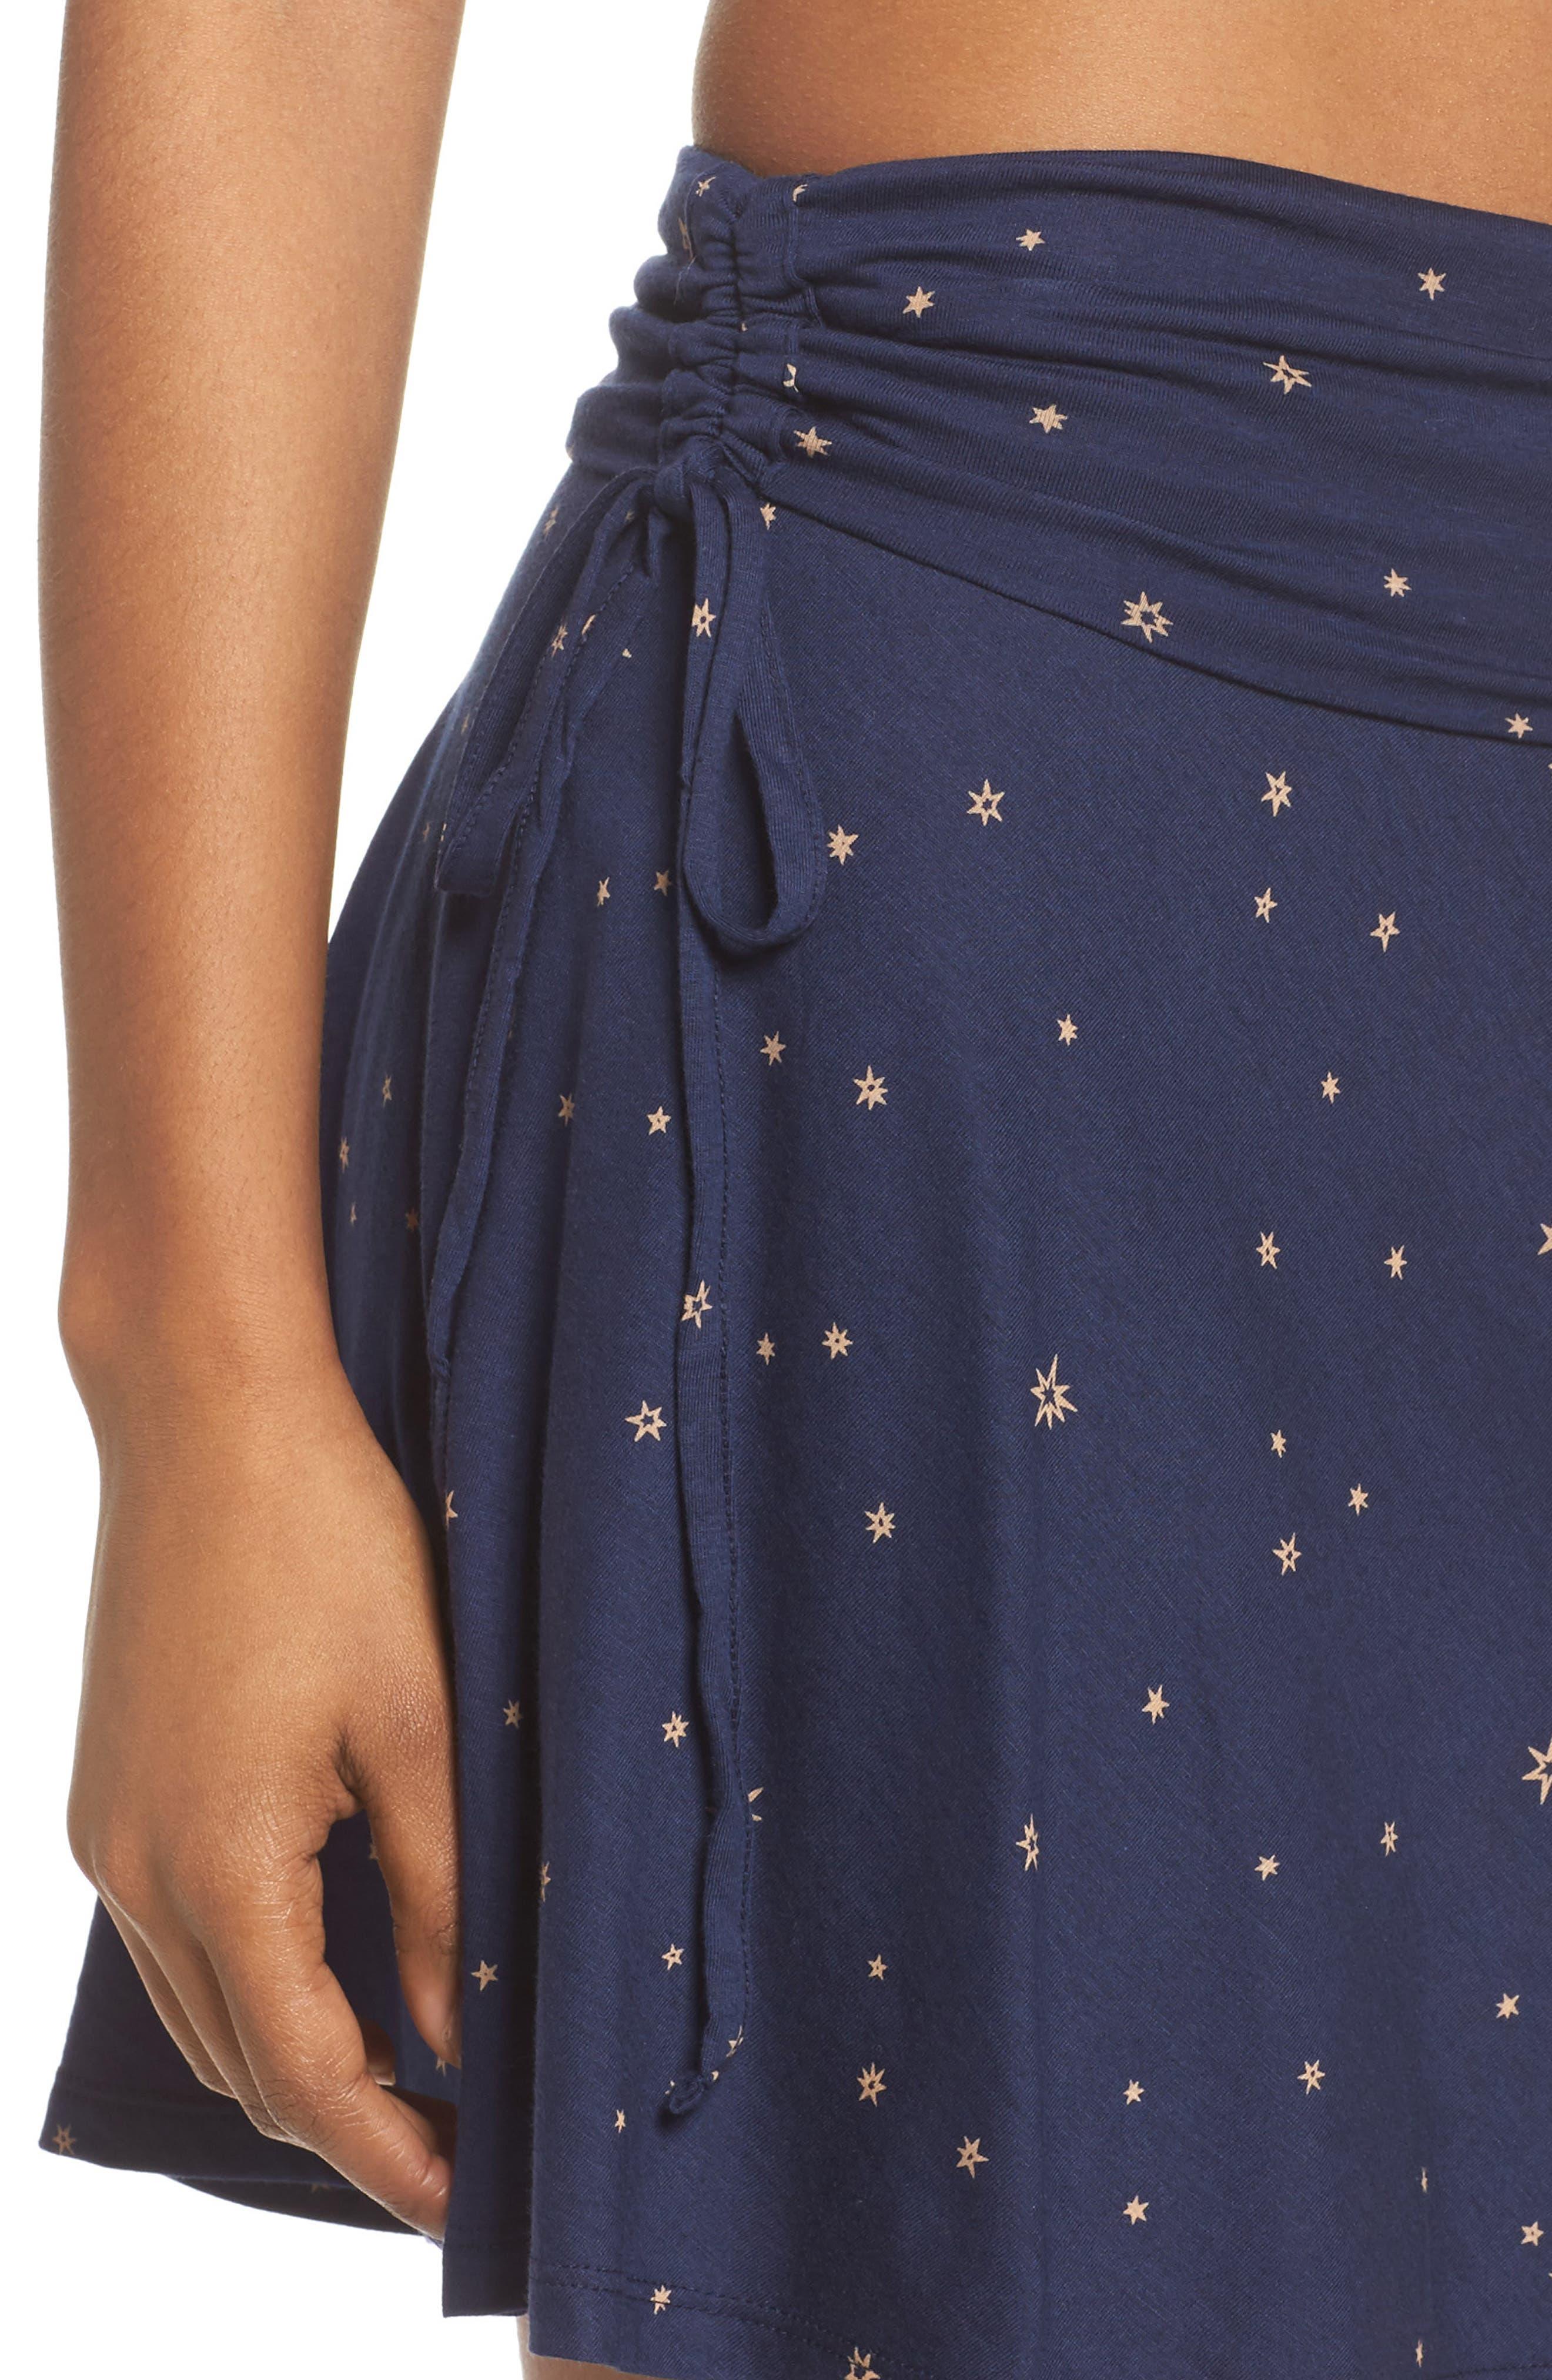 Lithia Cotton Blend Skirt,                             Alternate thumbnail 4, color,                             Micr Mica Pop Classic Navy